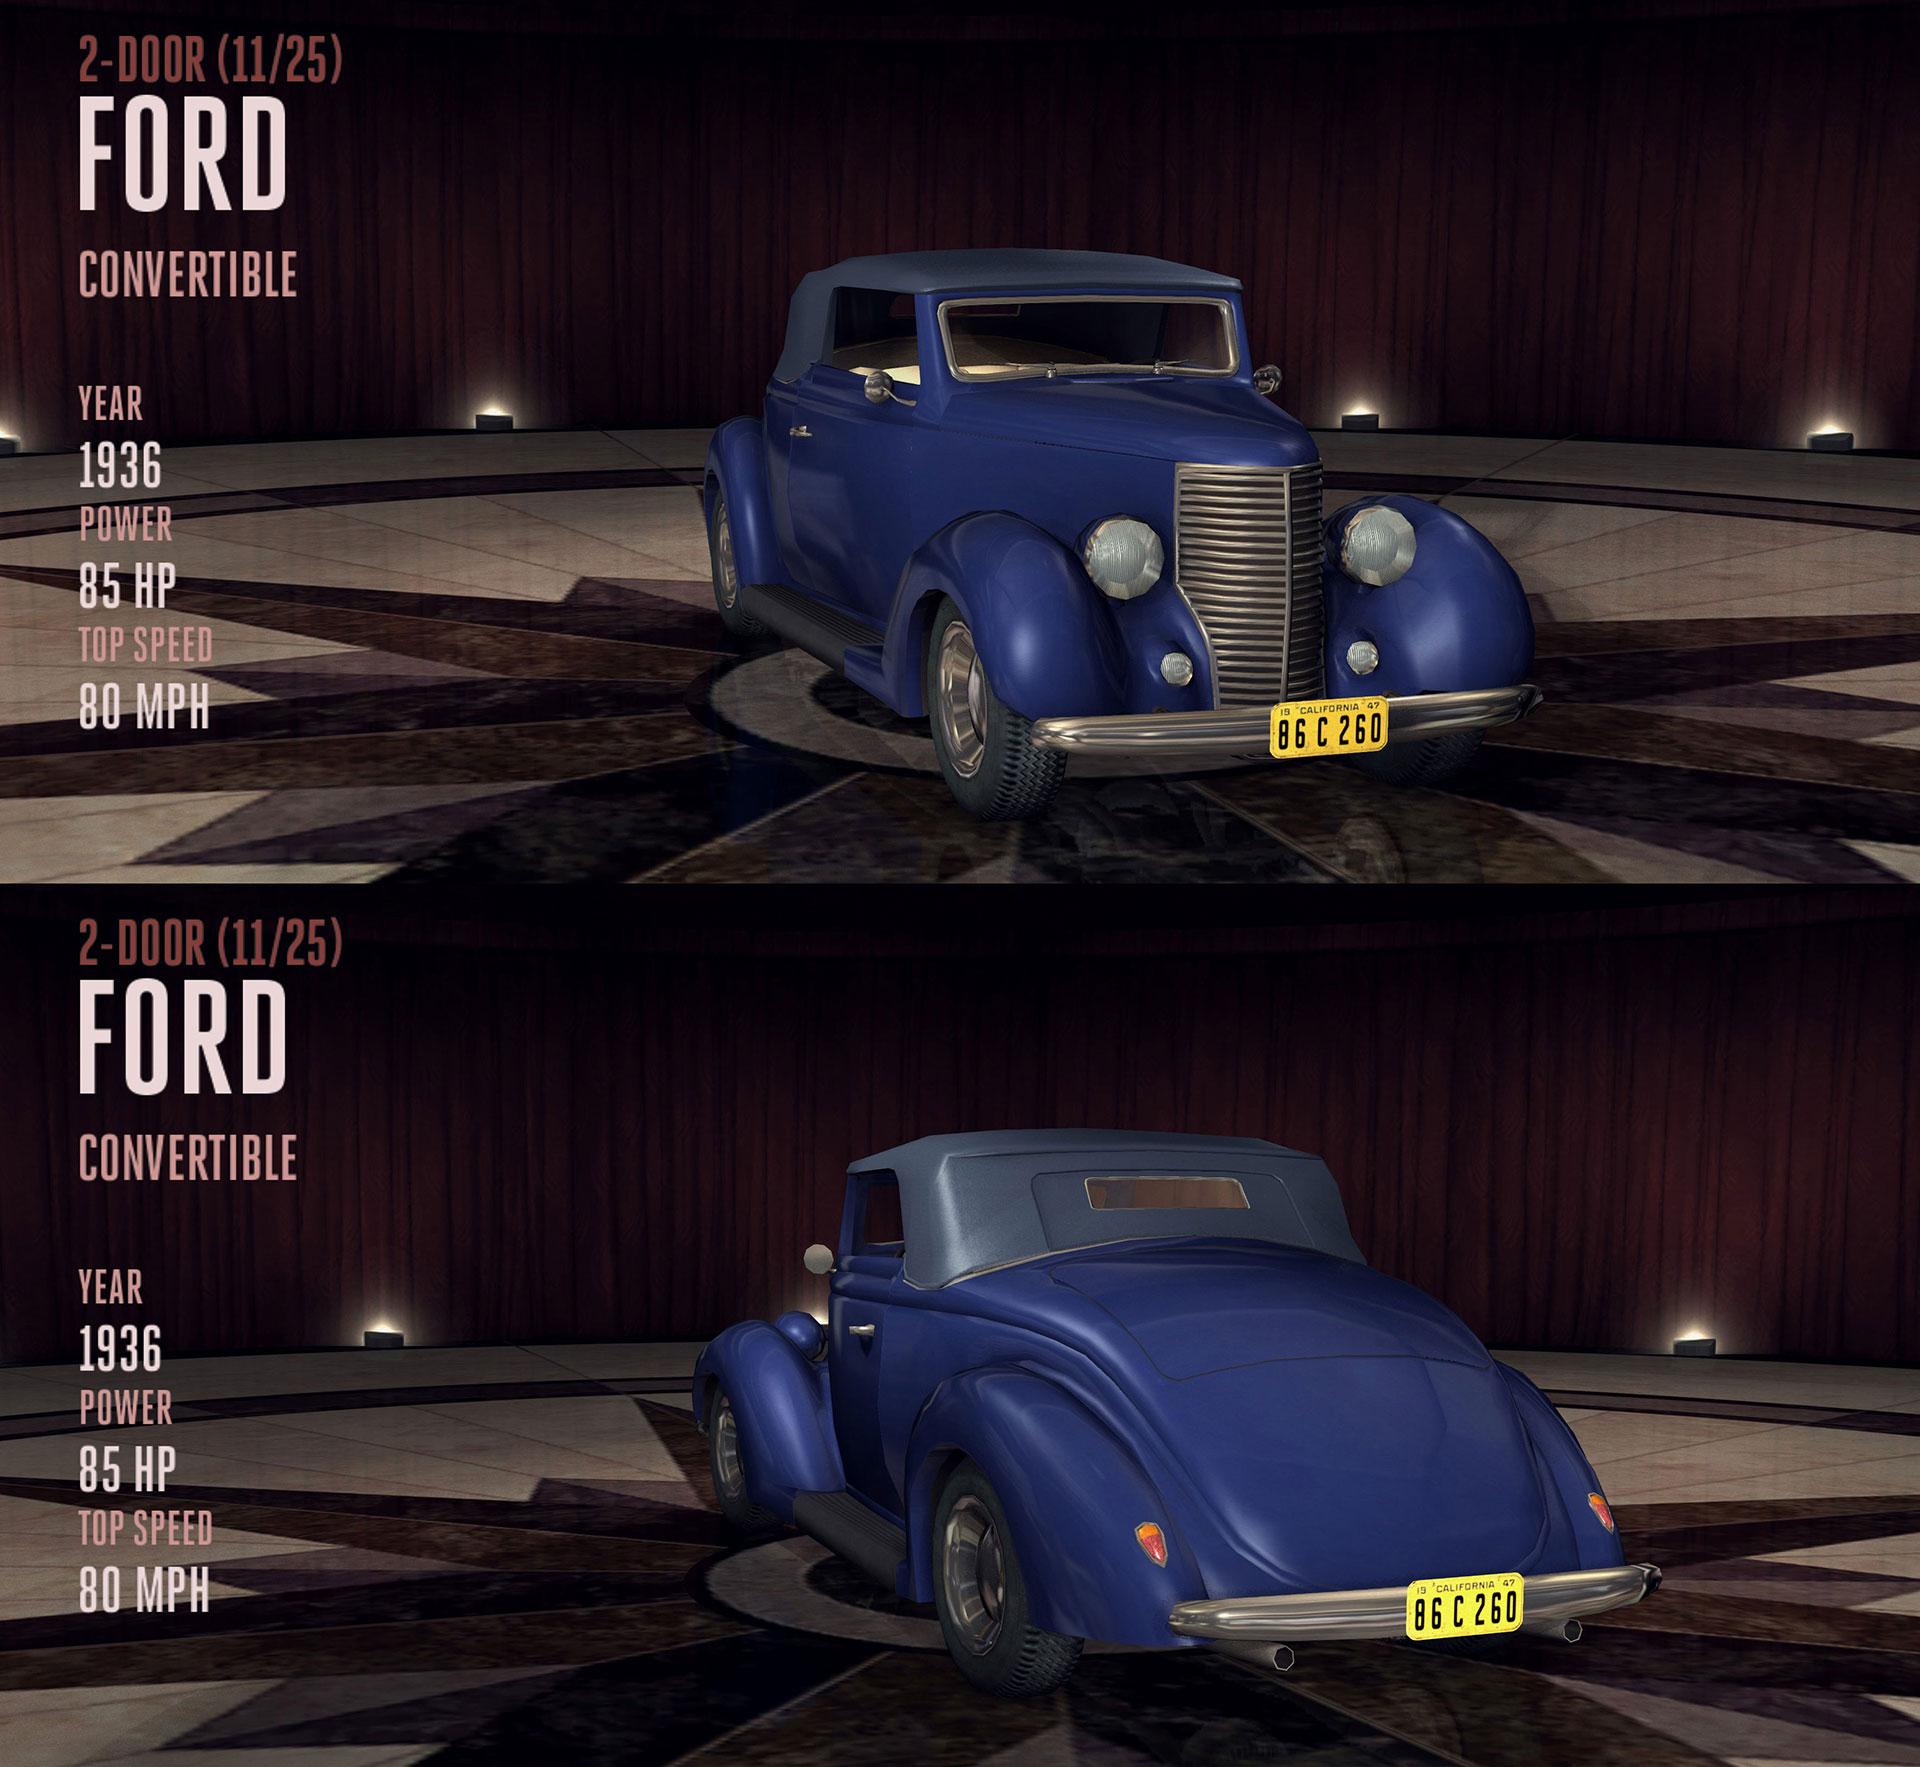 Archivo:1936-ford-convertible.jpg